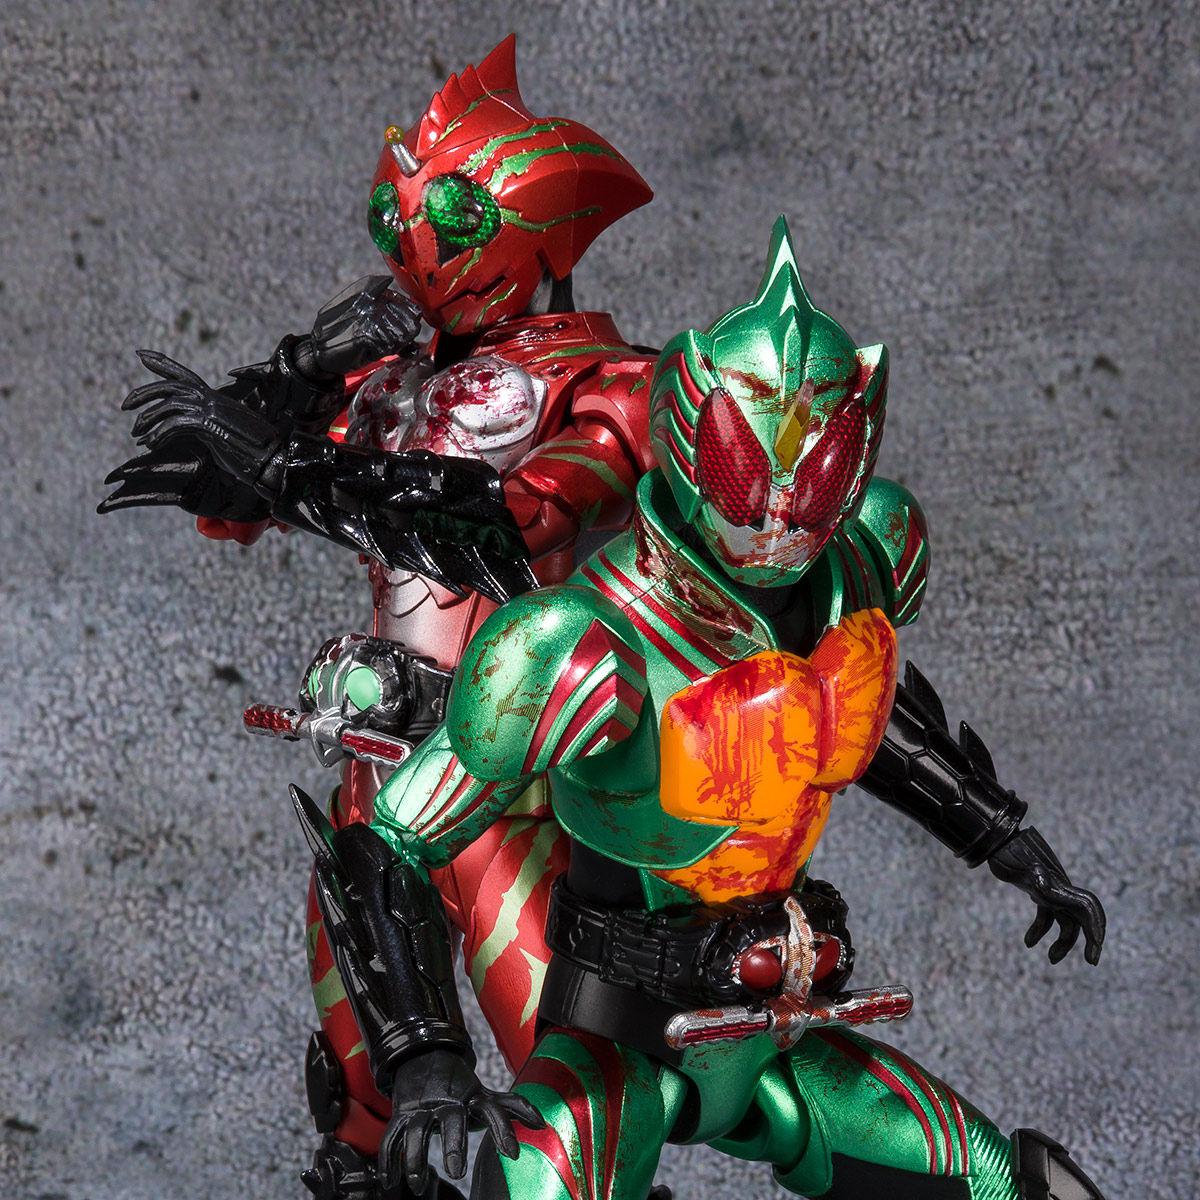 S.H.フィギュアーツ『仮面ライダーアマゾンズ 最後ノ審判セット』可動フィギュア-001